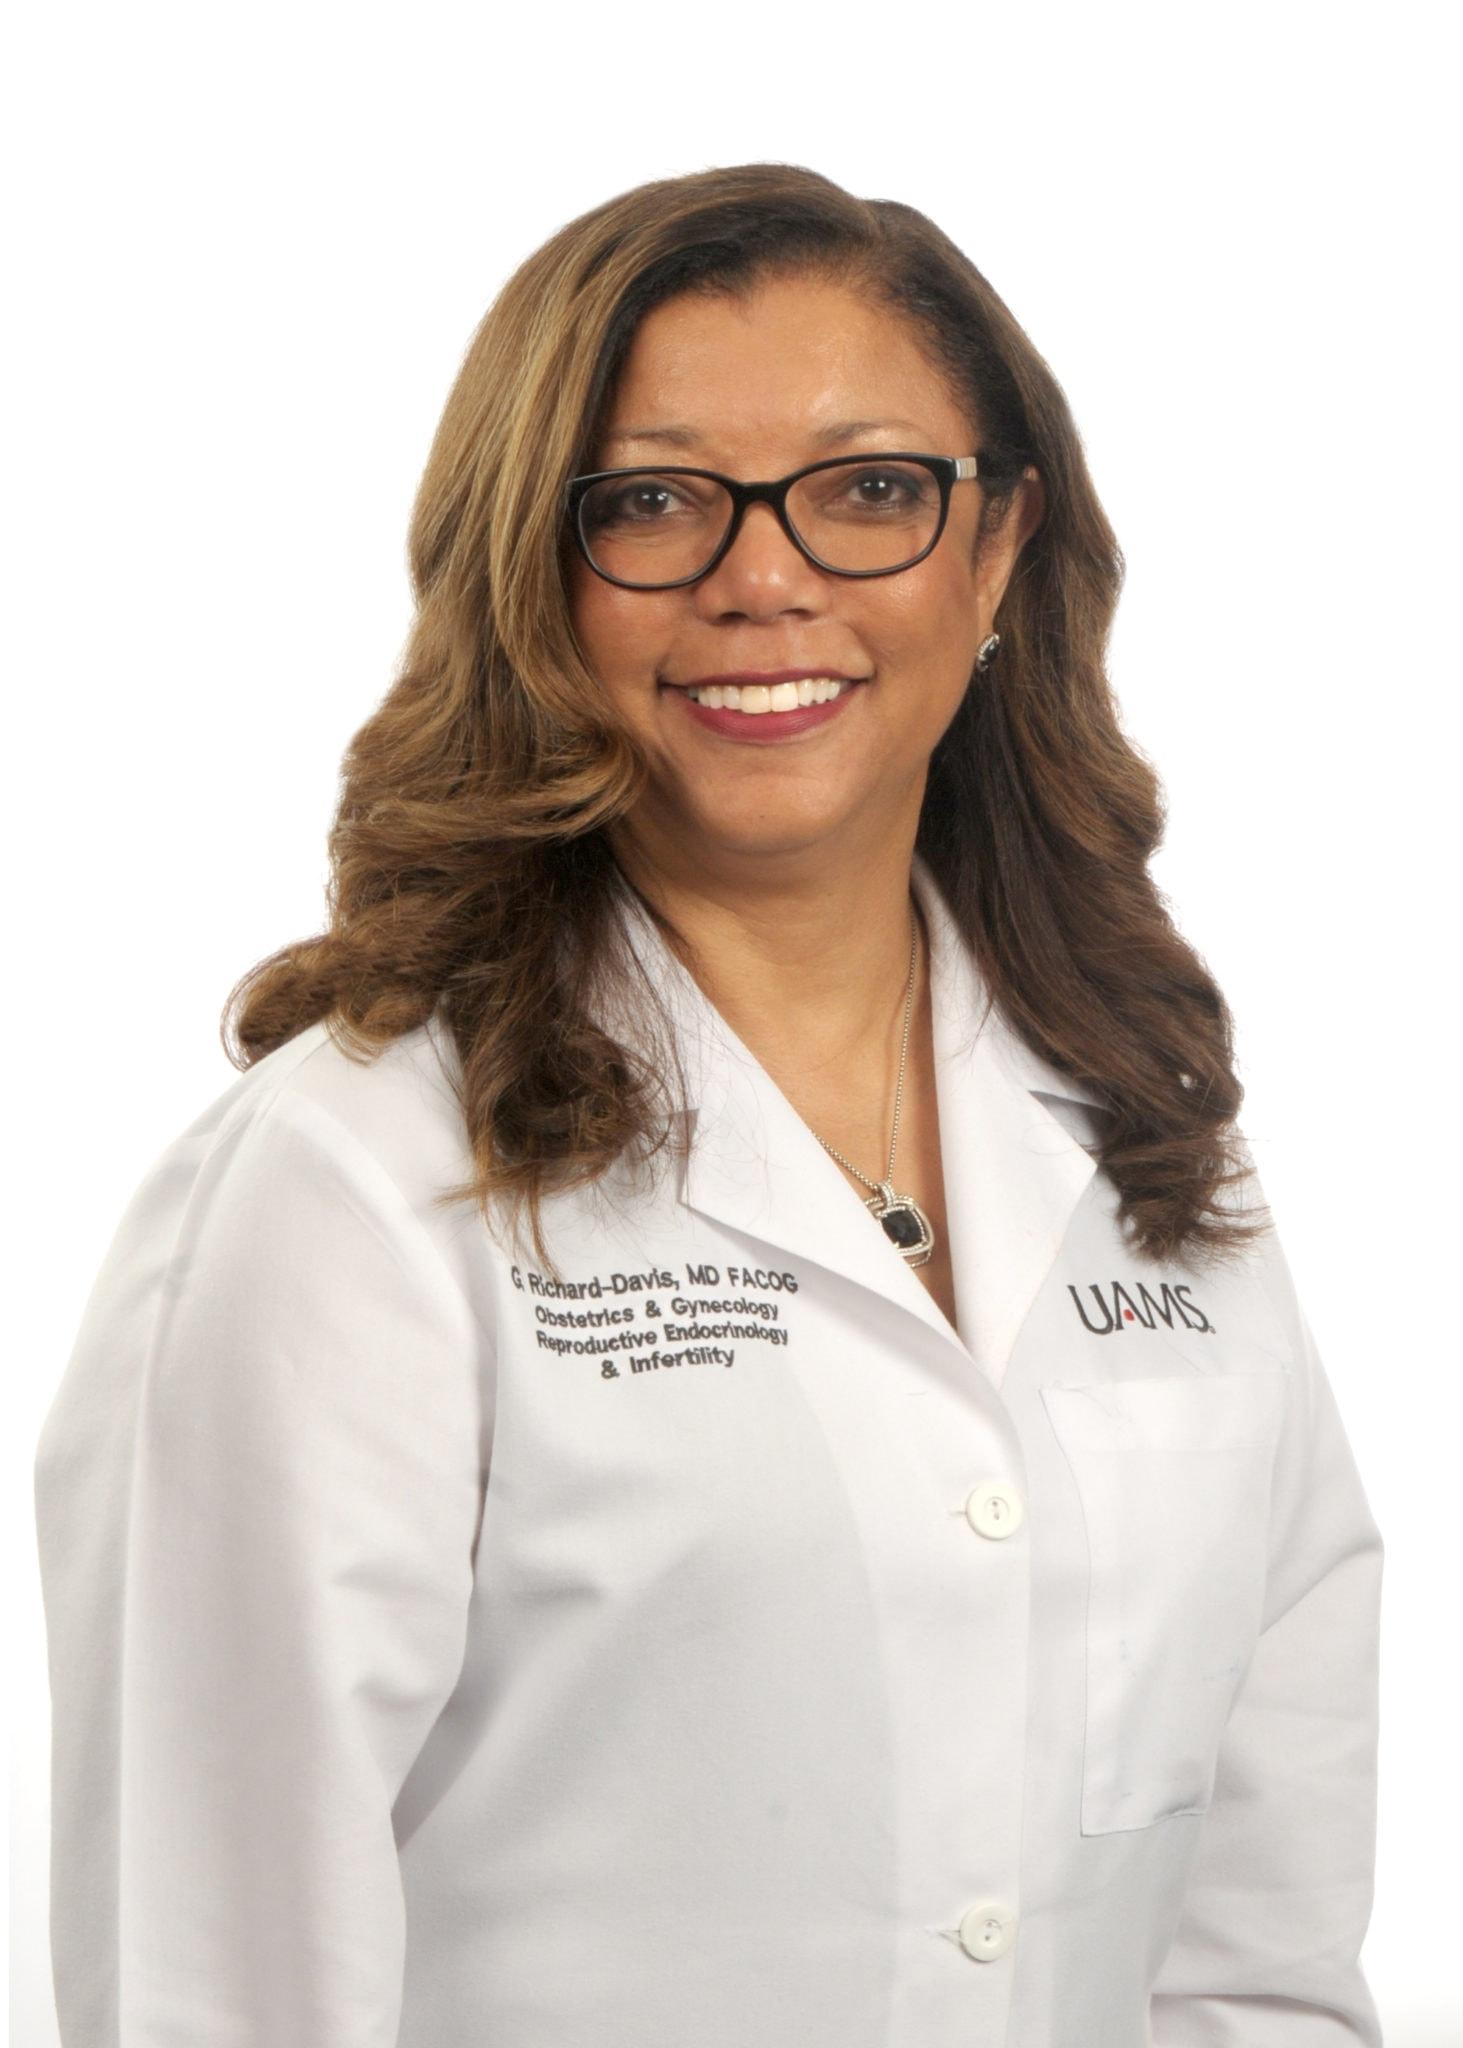 Gloria Richard-Davis, M.D., FACOG